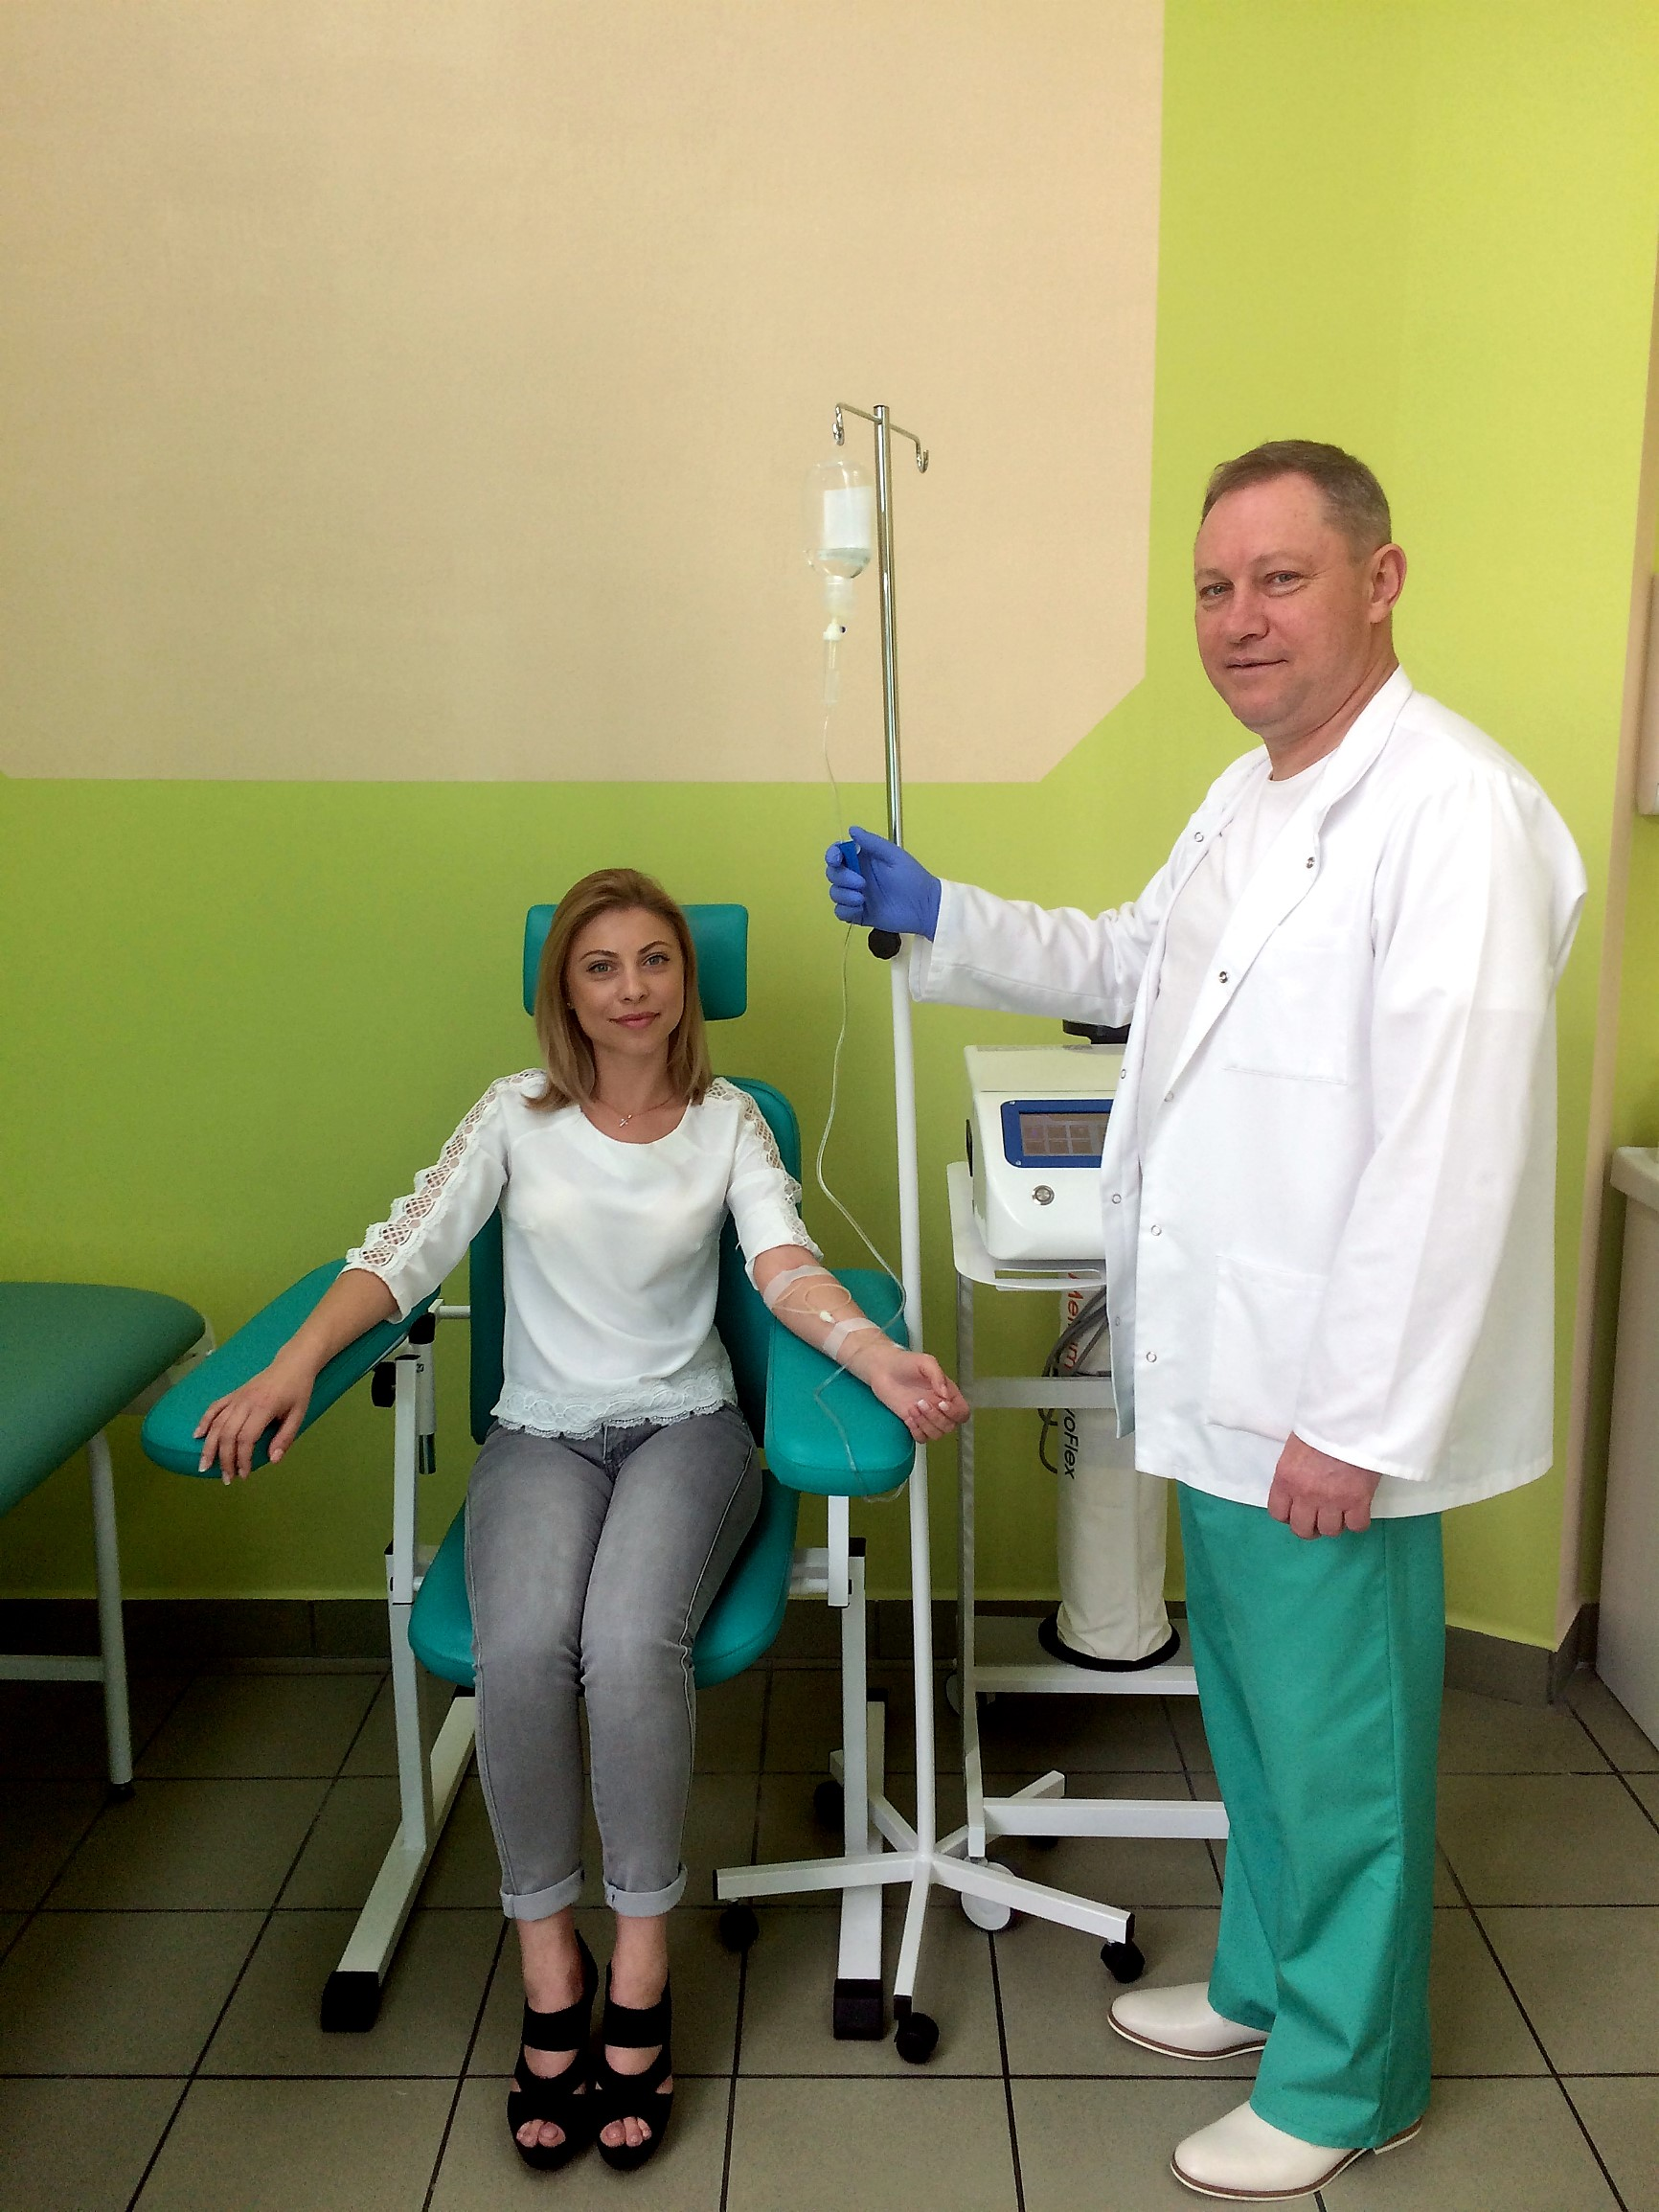 https://www.ozonoterapia.bydgoszcz.pl/wp-content/uploads/2017/06/17171.jpg